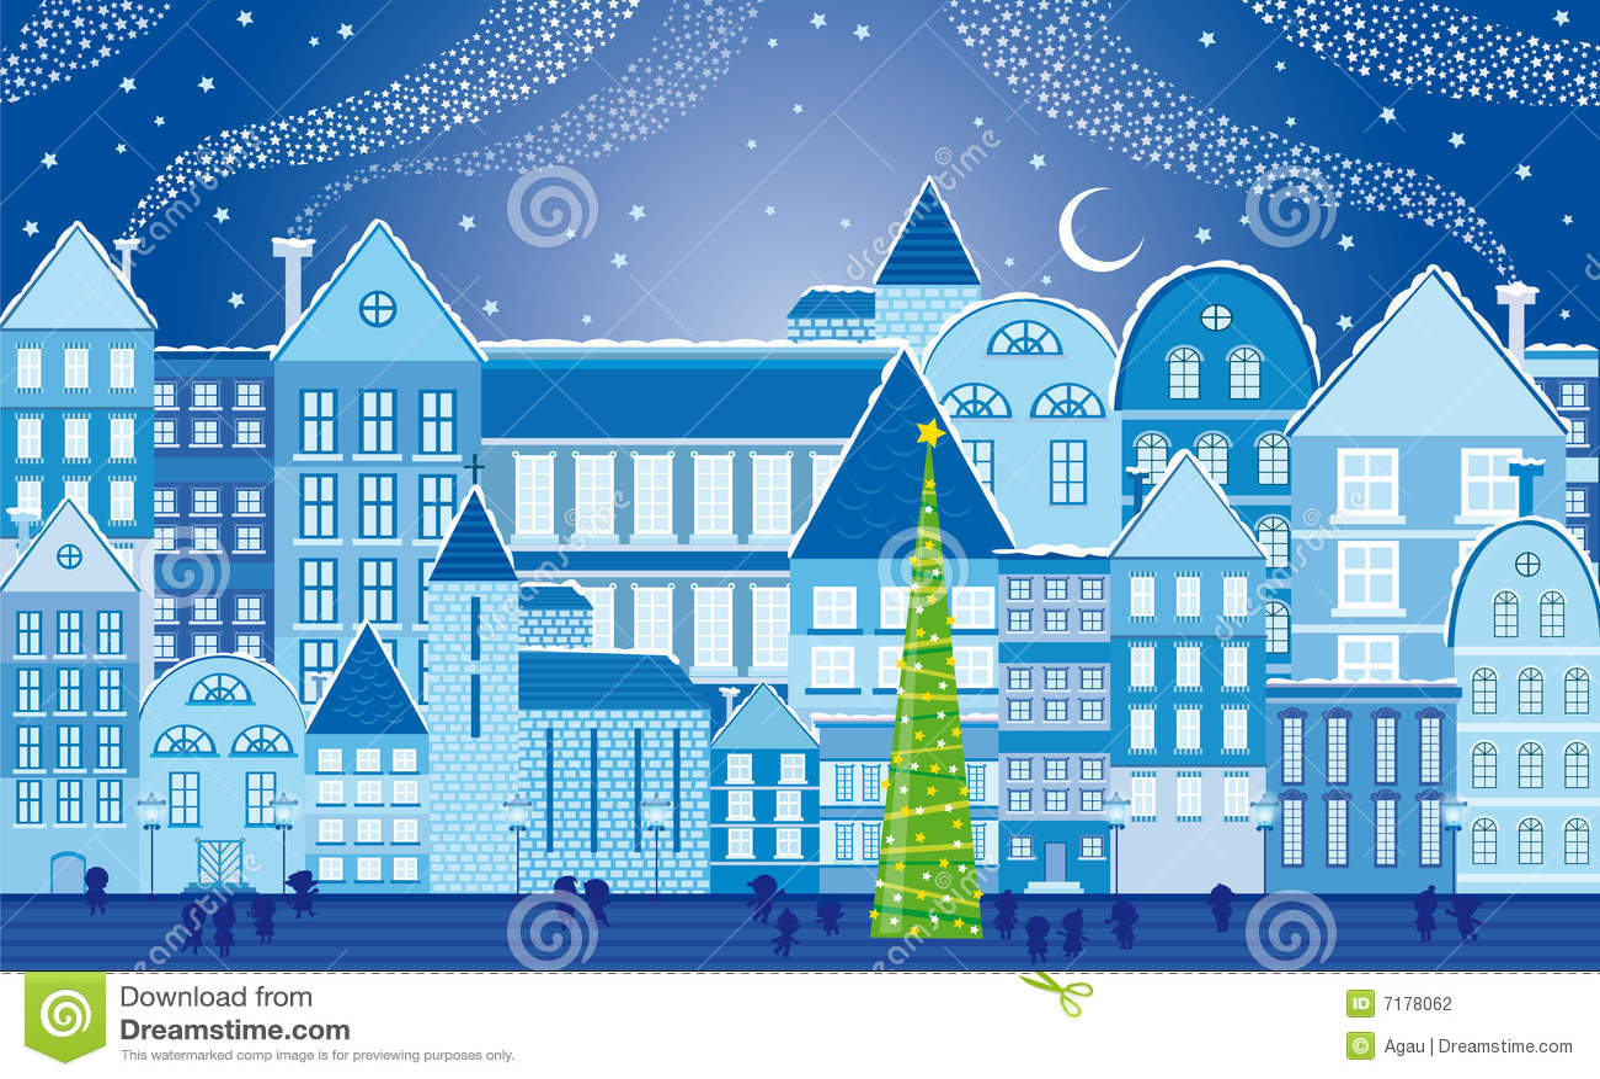 Christmas town at night